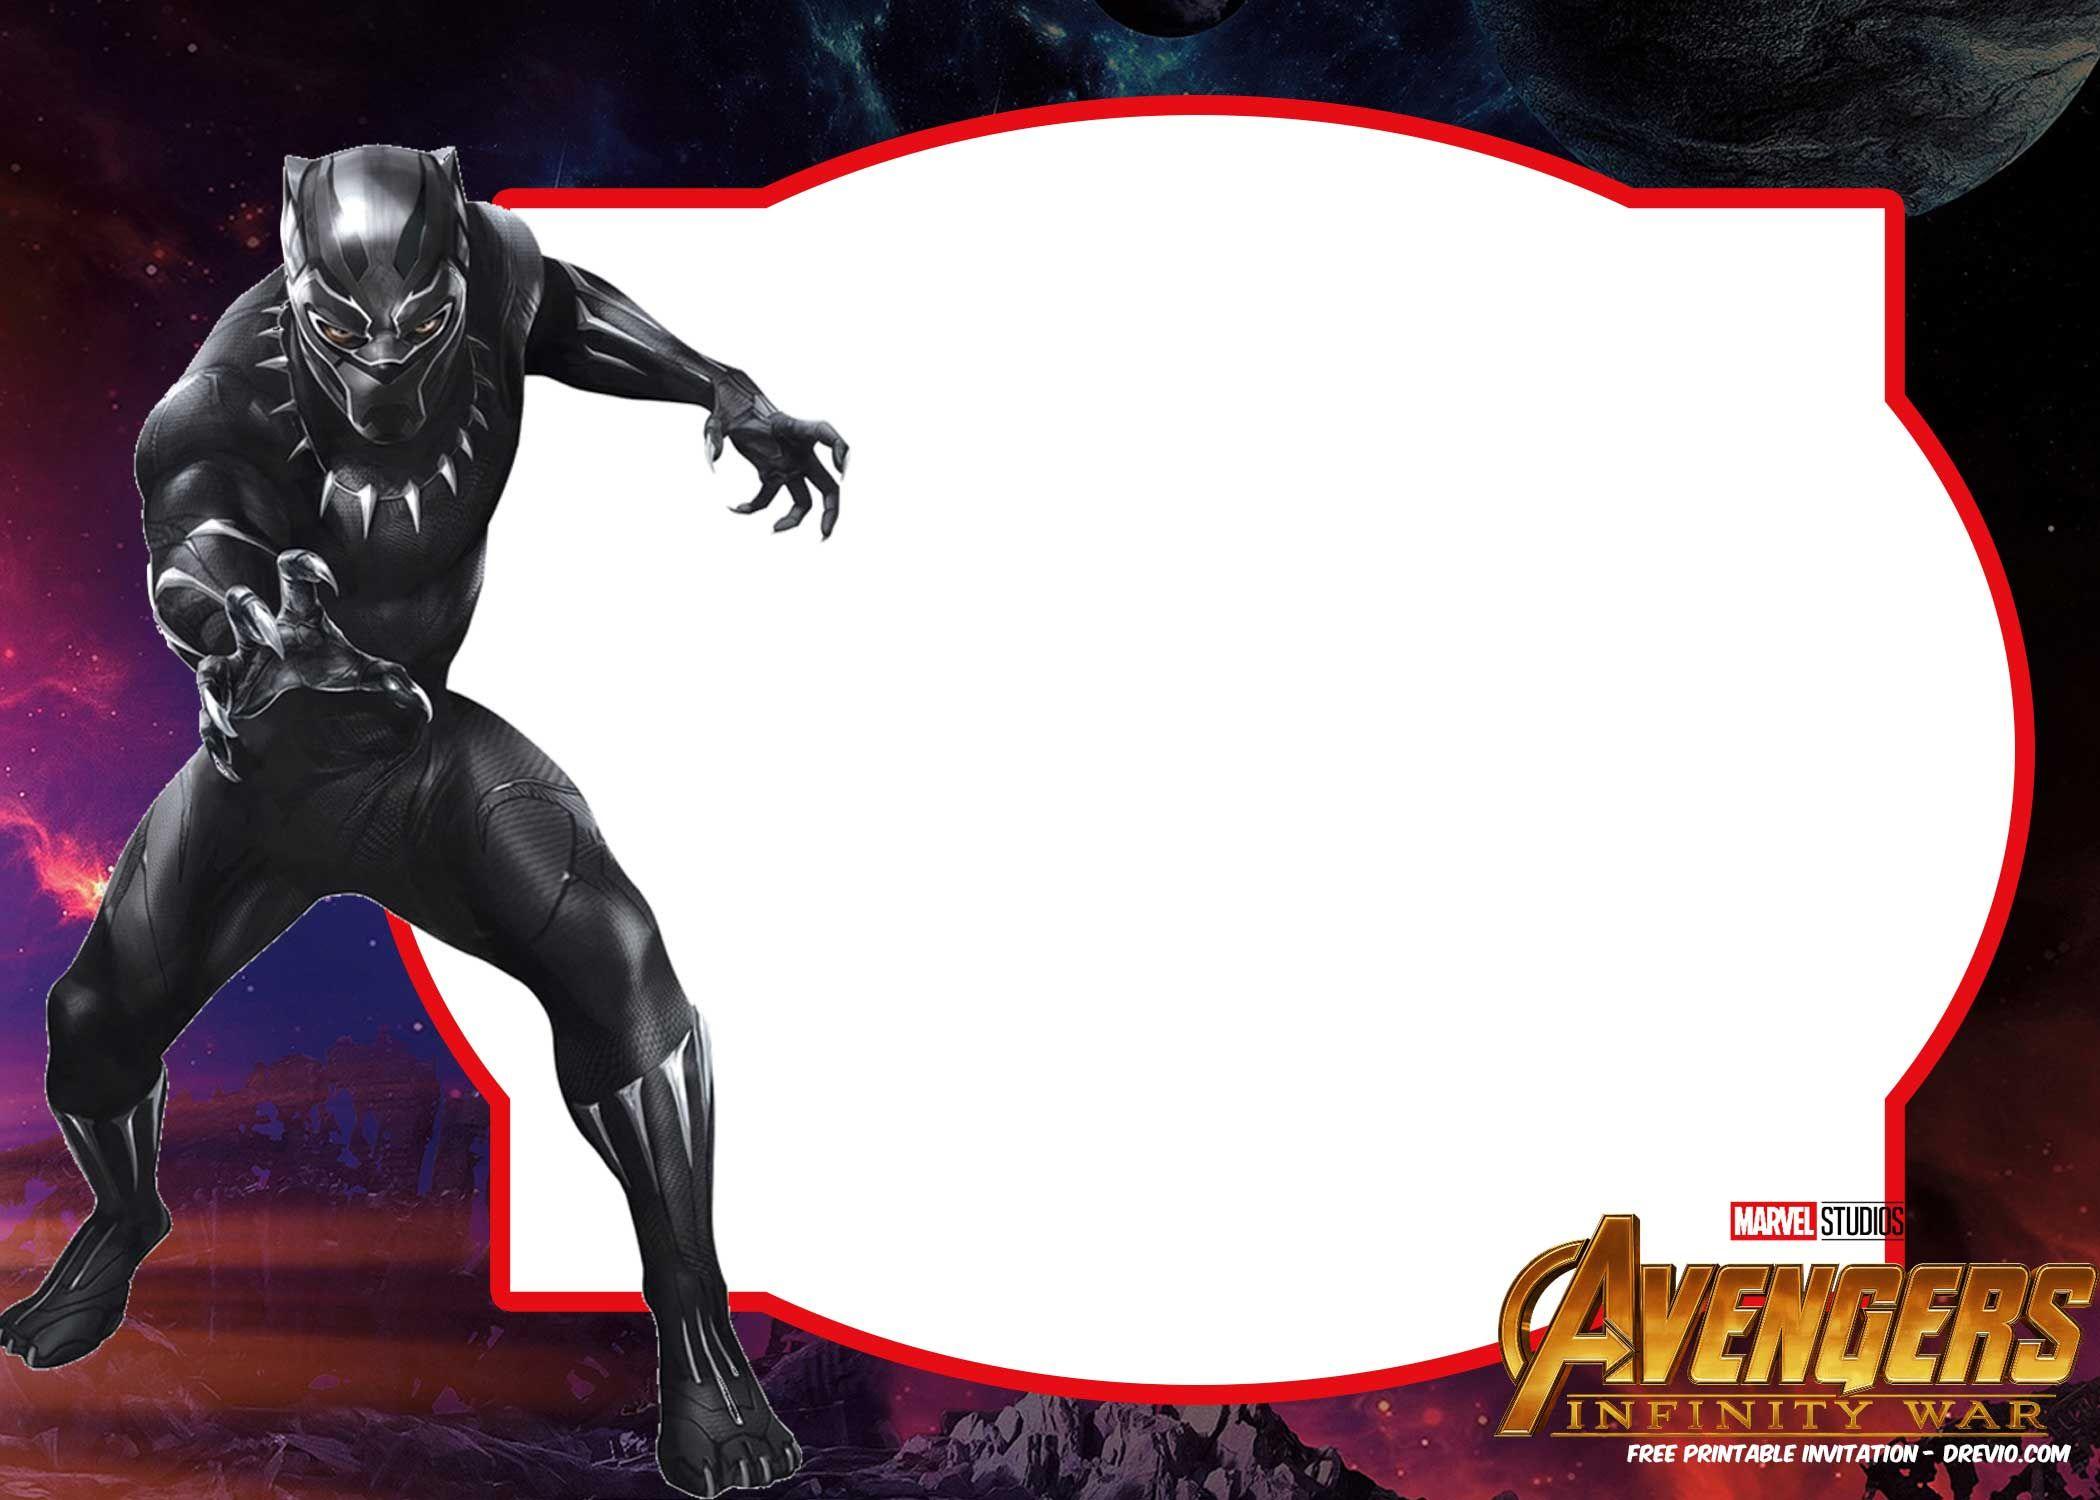 Free Avengers Infinity Wars Birthday Invitation Templates – All - Avengers Party Invitations Printable Free